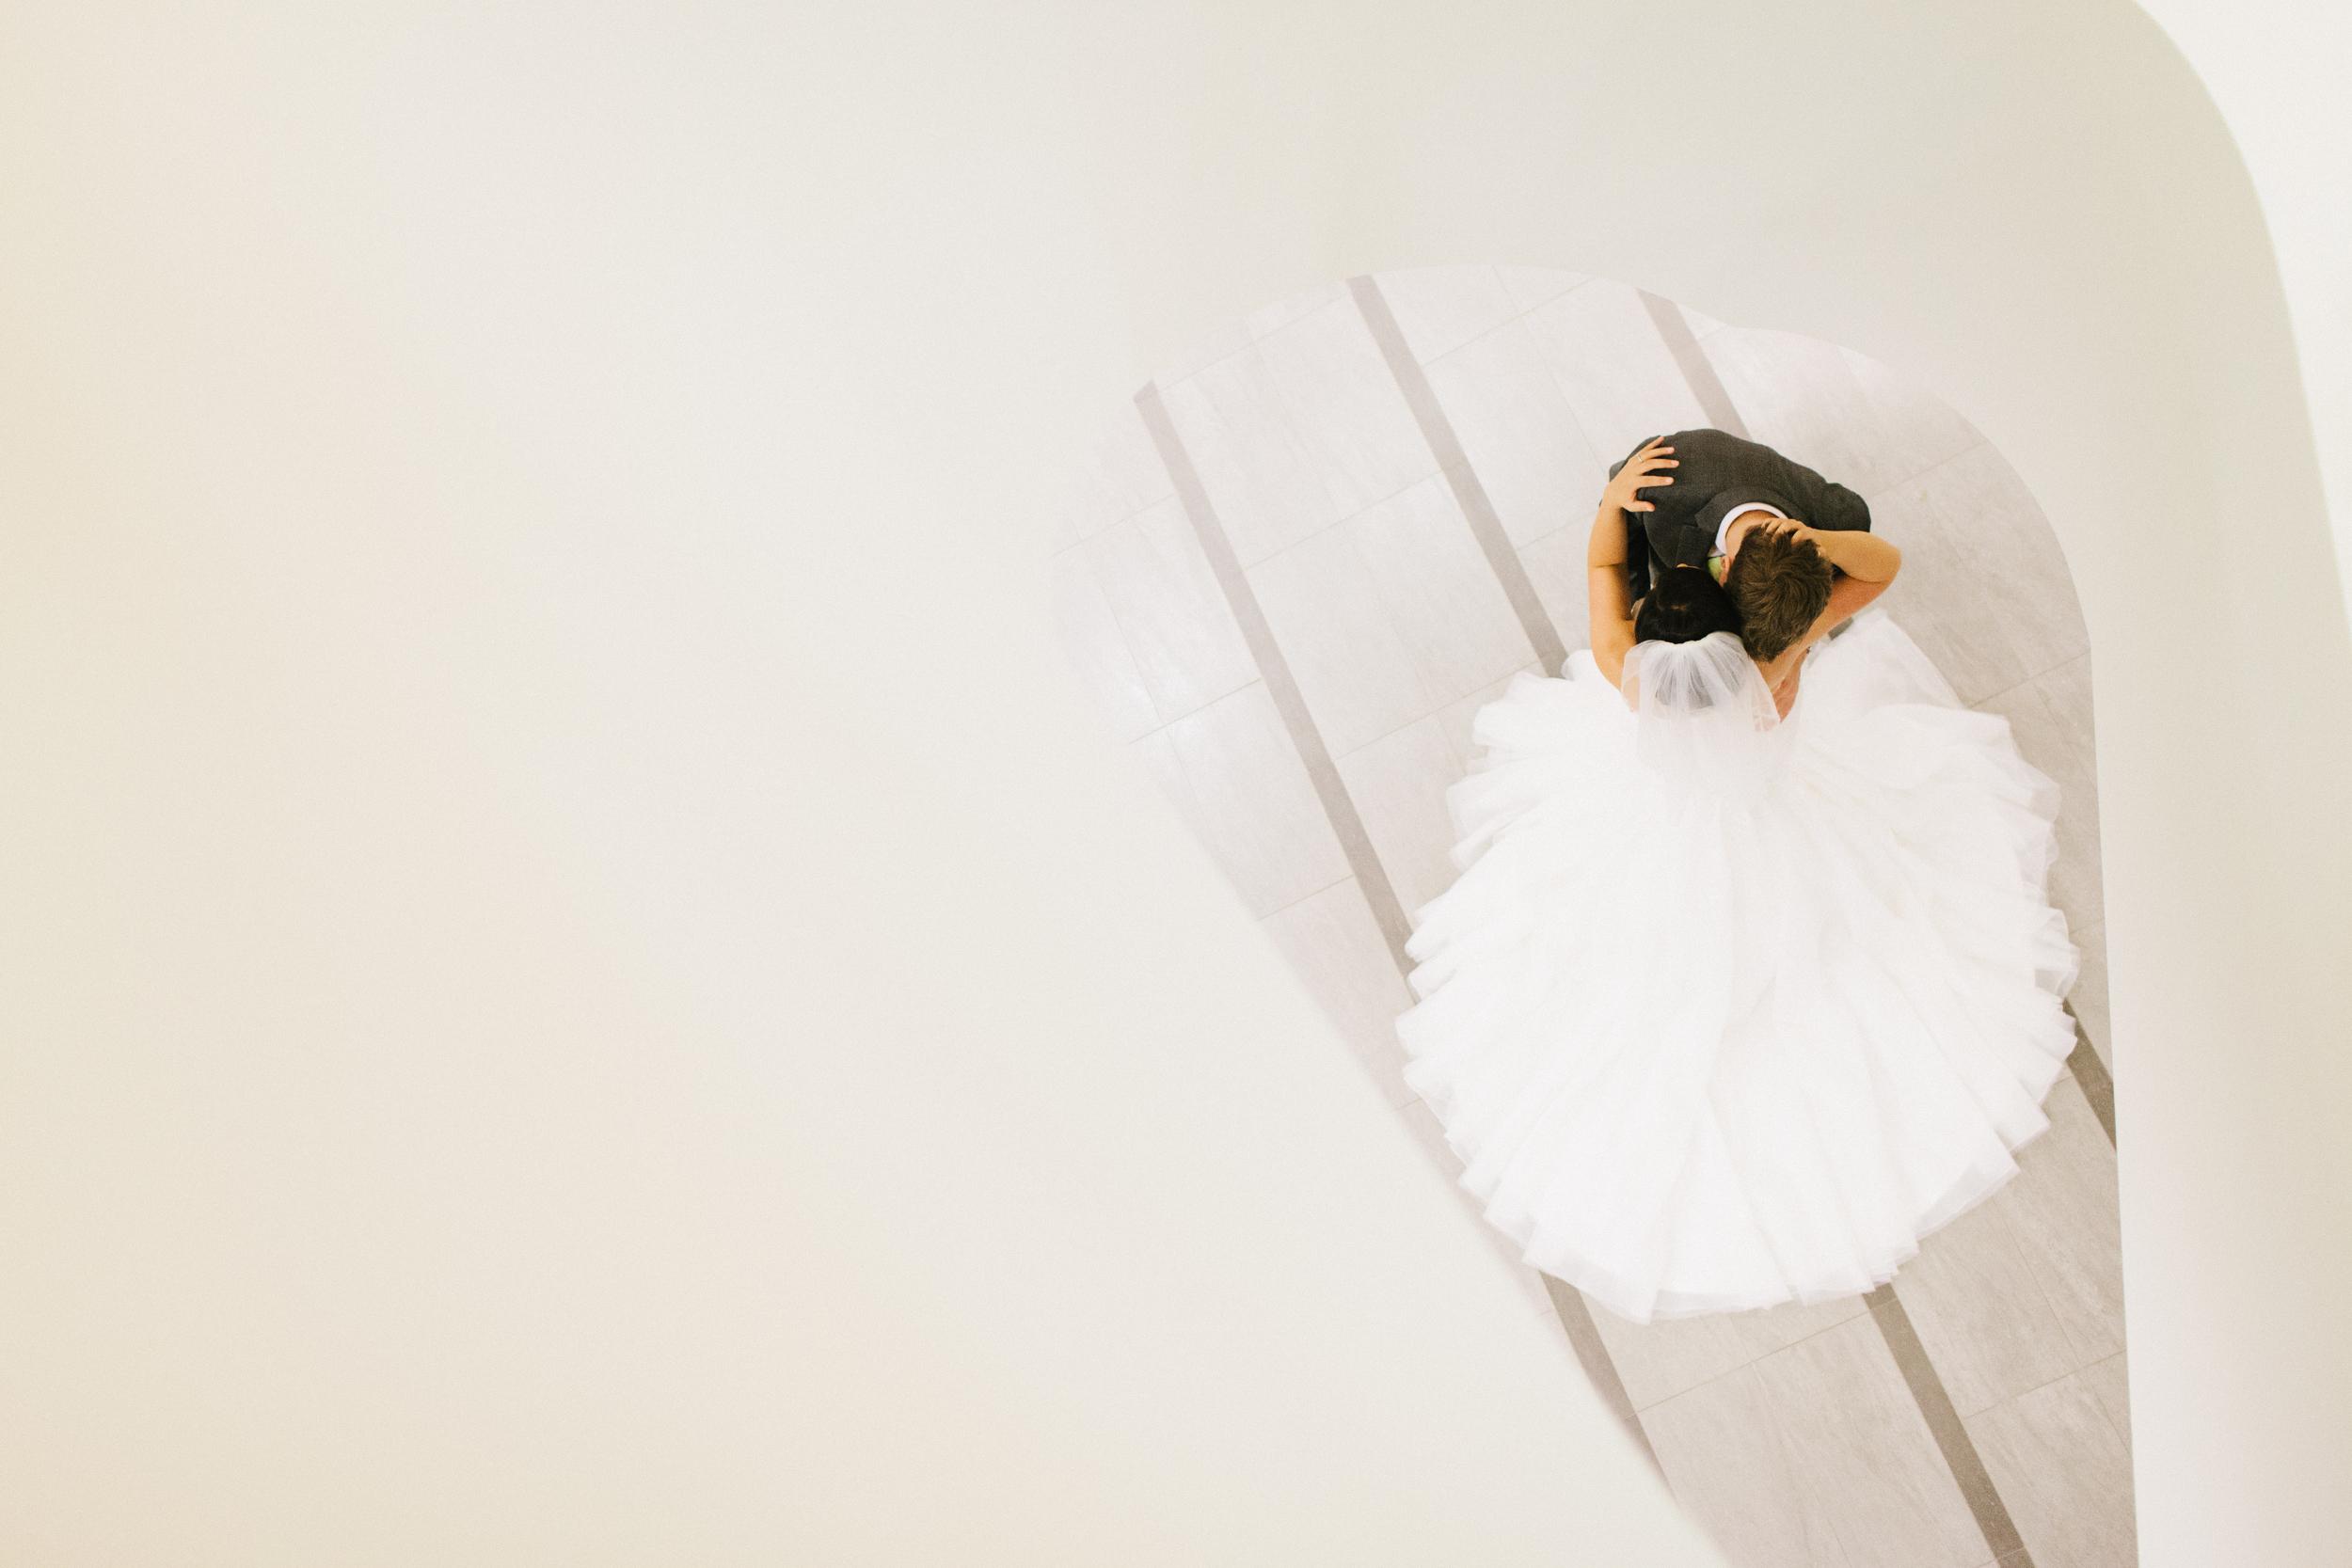 harbour-banquet-hall-oakville-wedding-photographer-michael-rousseau-photography-persian-wedding-photographer-isabella-daniel014.JPG